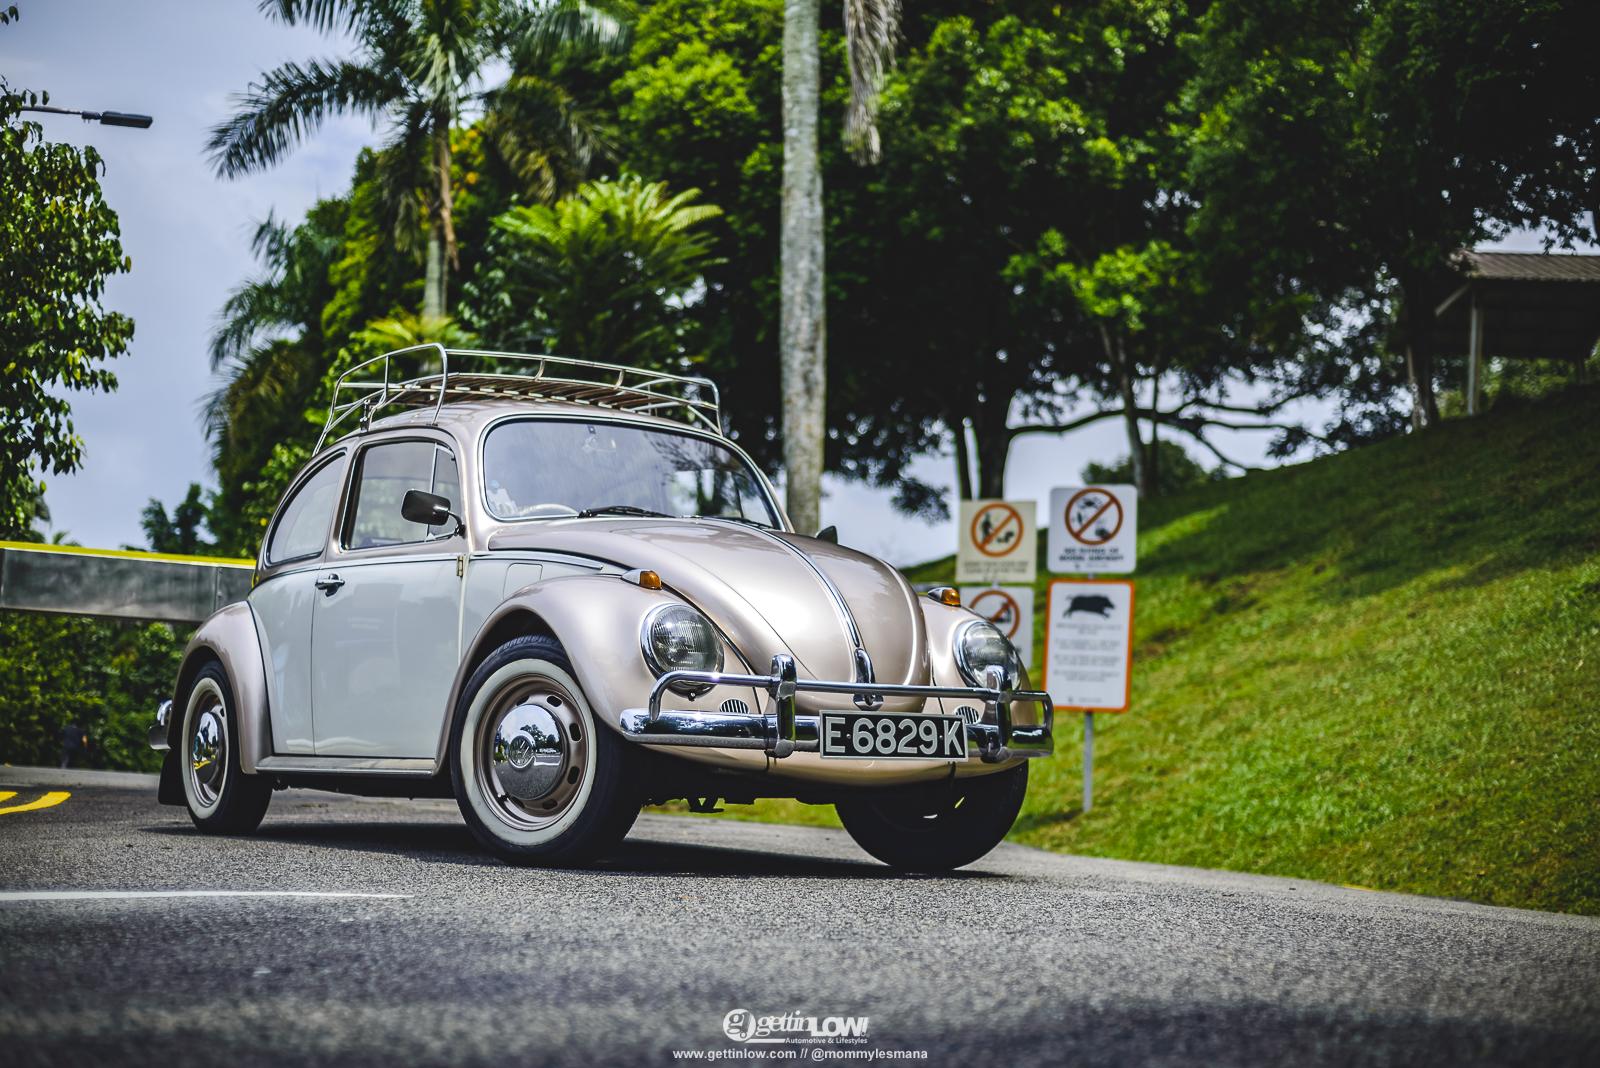 Ling's VW Beetle Singapore